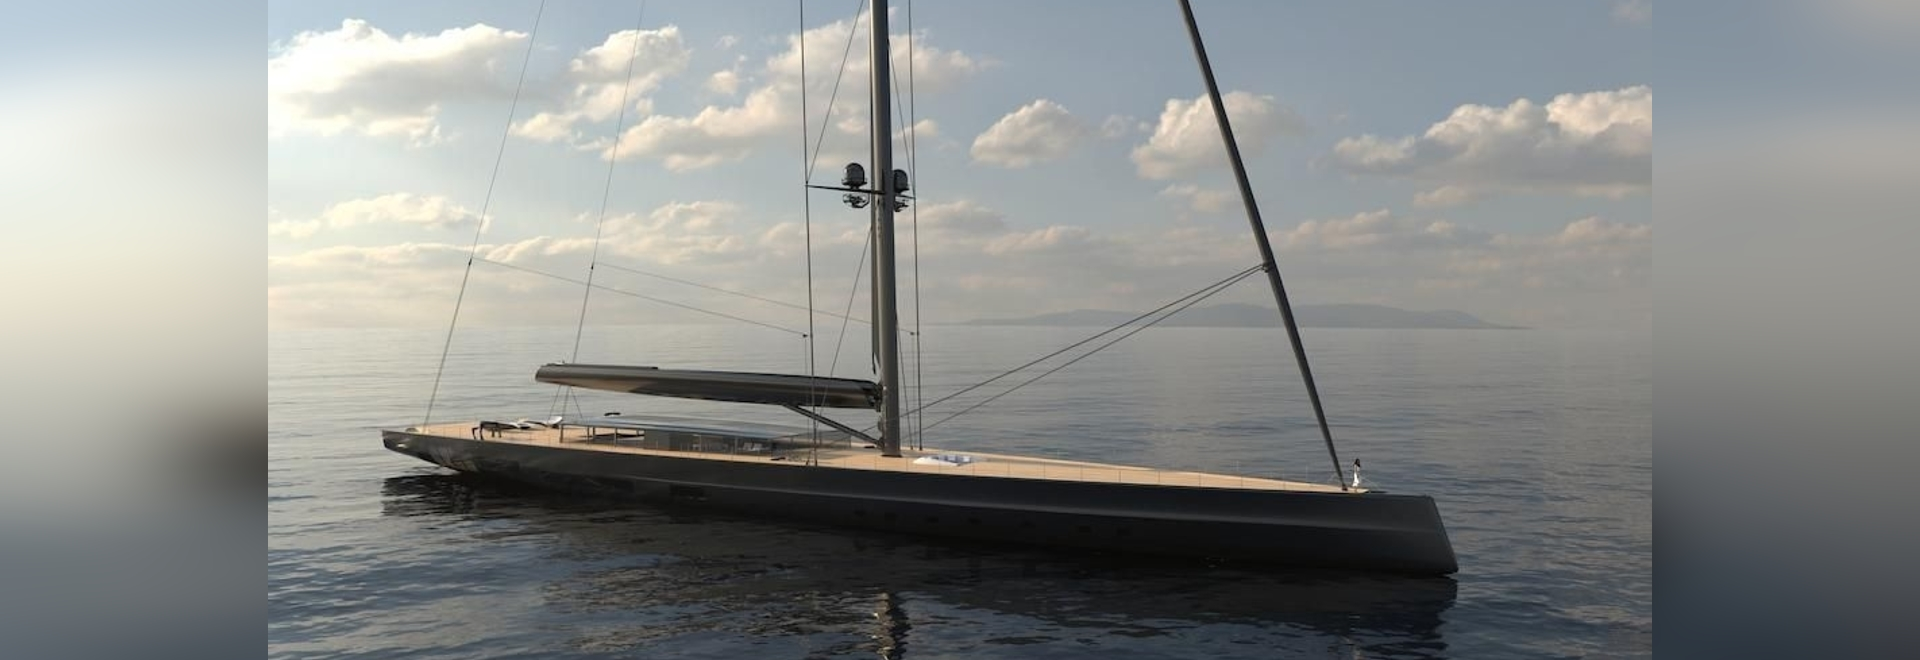 Apex 850: Royal Huisman's new 85m McKeon super sloop